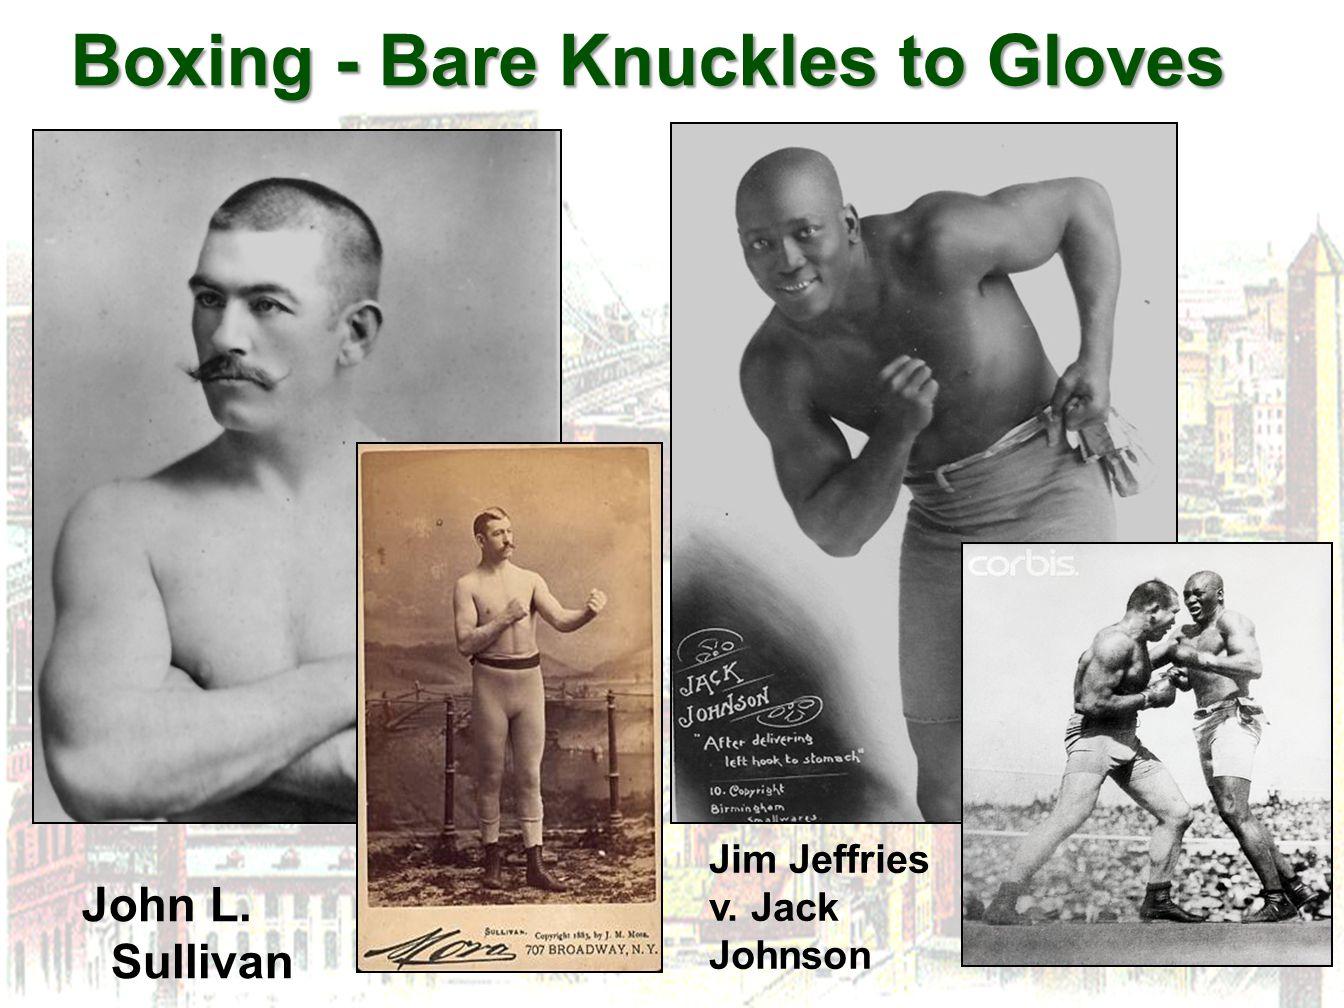 Boxing - Bare Knuckles to Gloves Boxing - Bare Knuckles to Gloves John L. Sullivan Jim Jeffries v. Jack Johnson